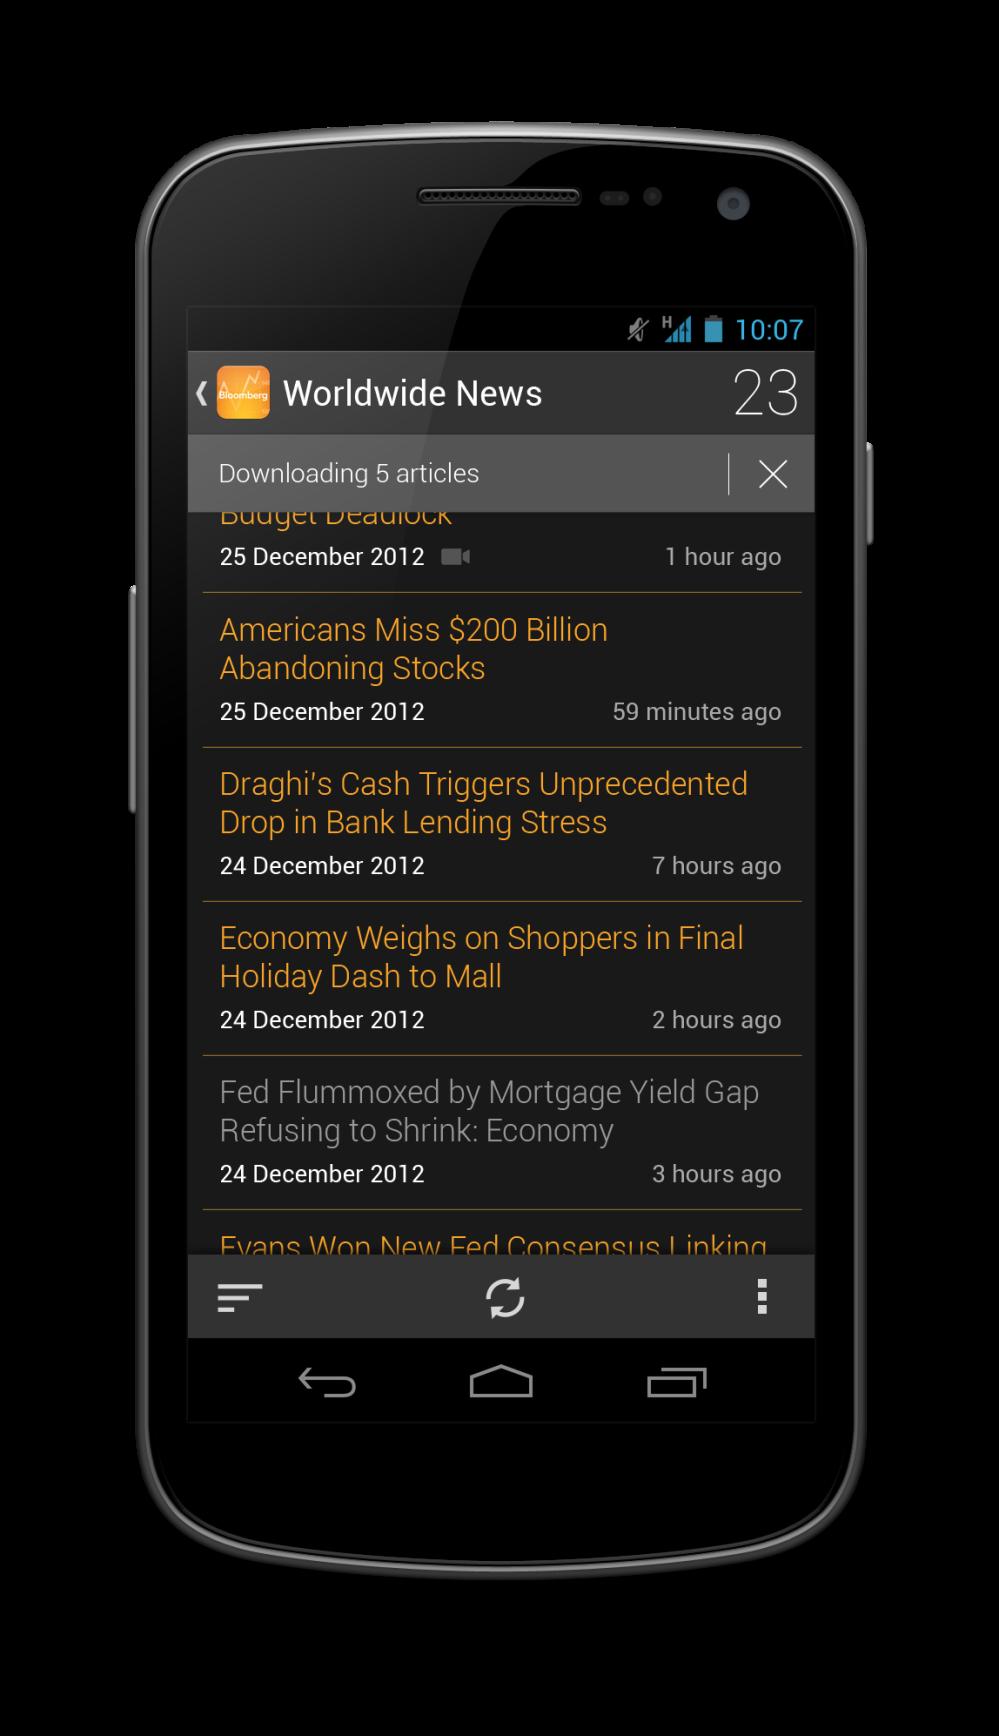 Worldwide News